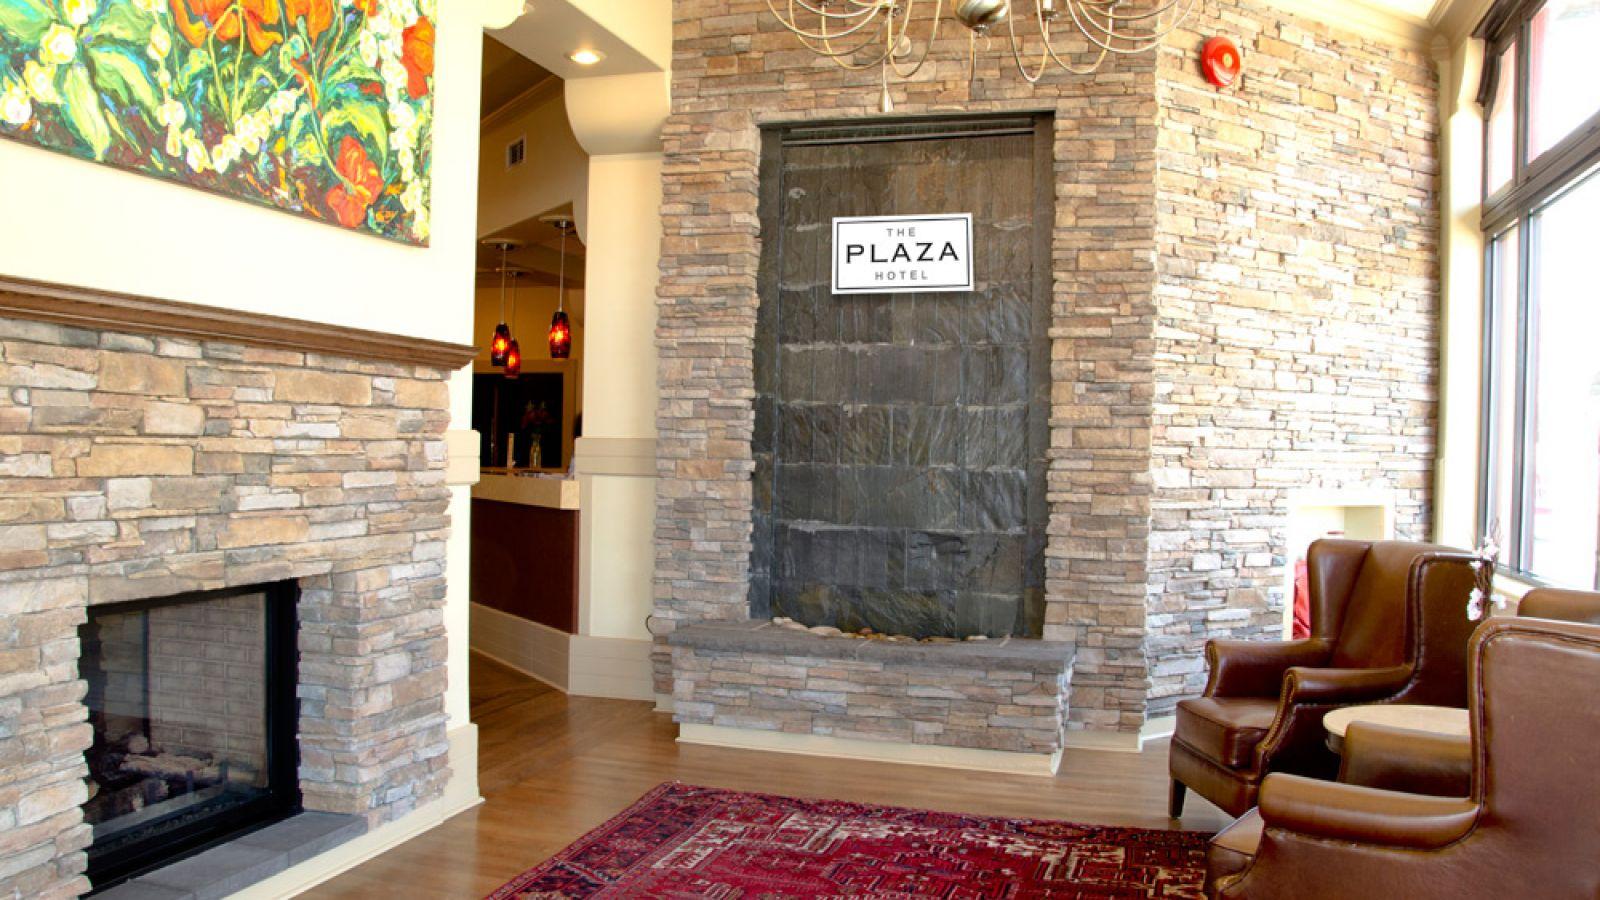 Plaza Hotel Kamloops Lobby